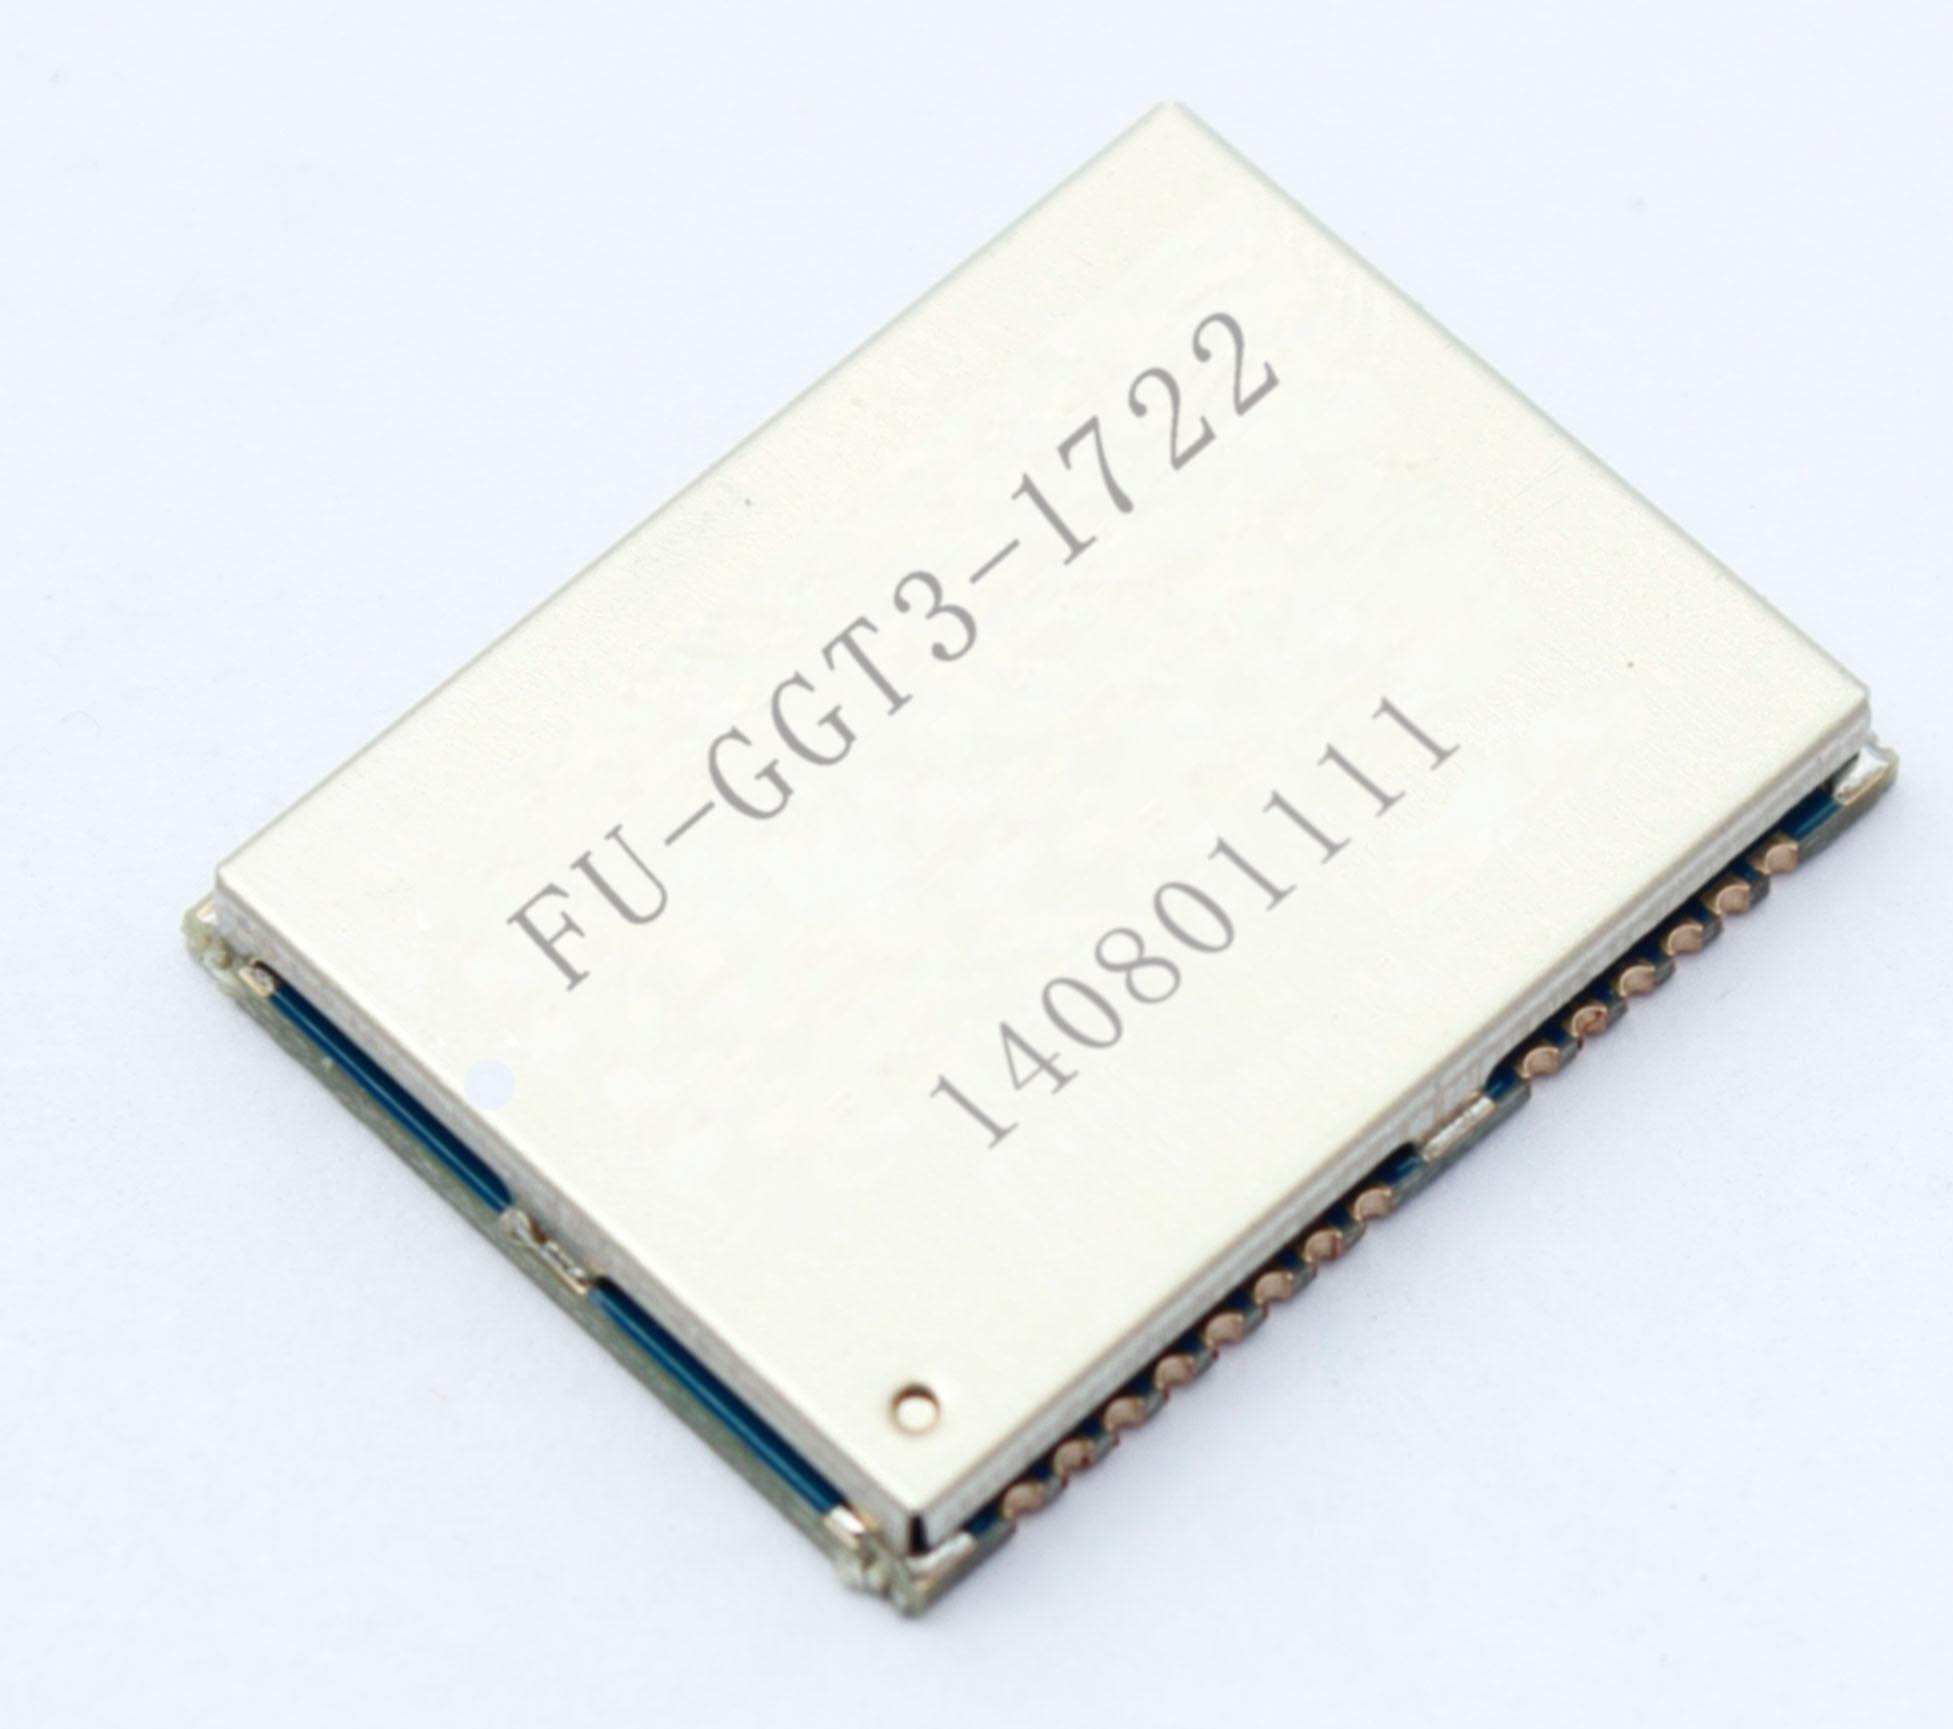 GPS+GLONASS  模组FU-GGT3-1722